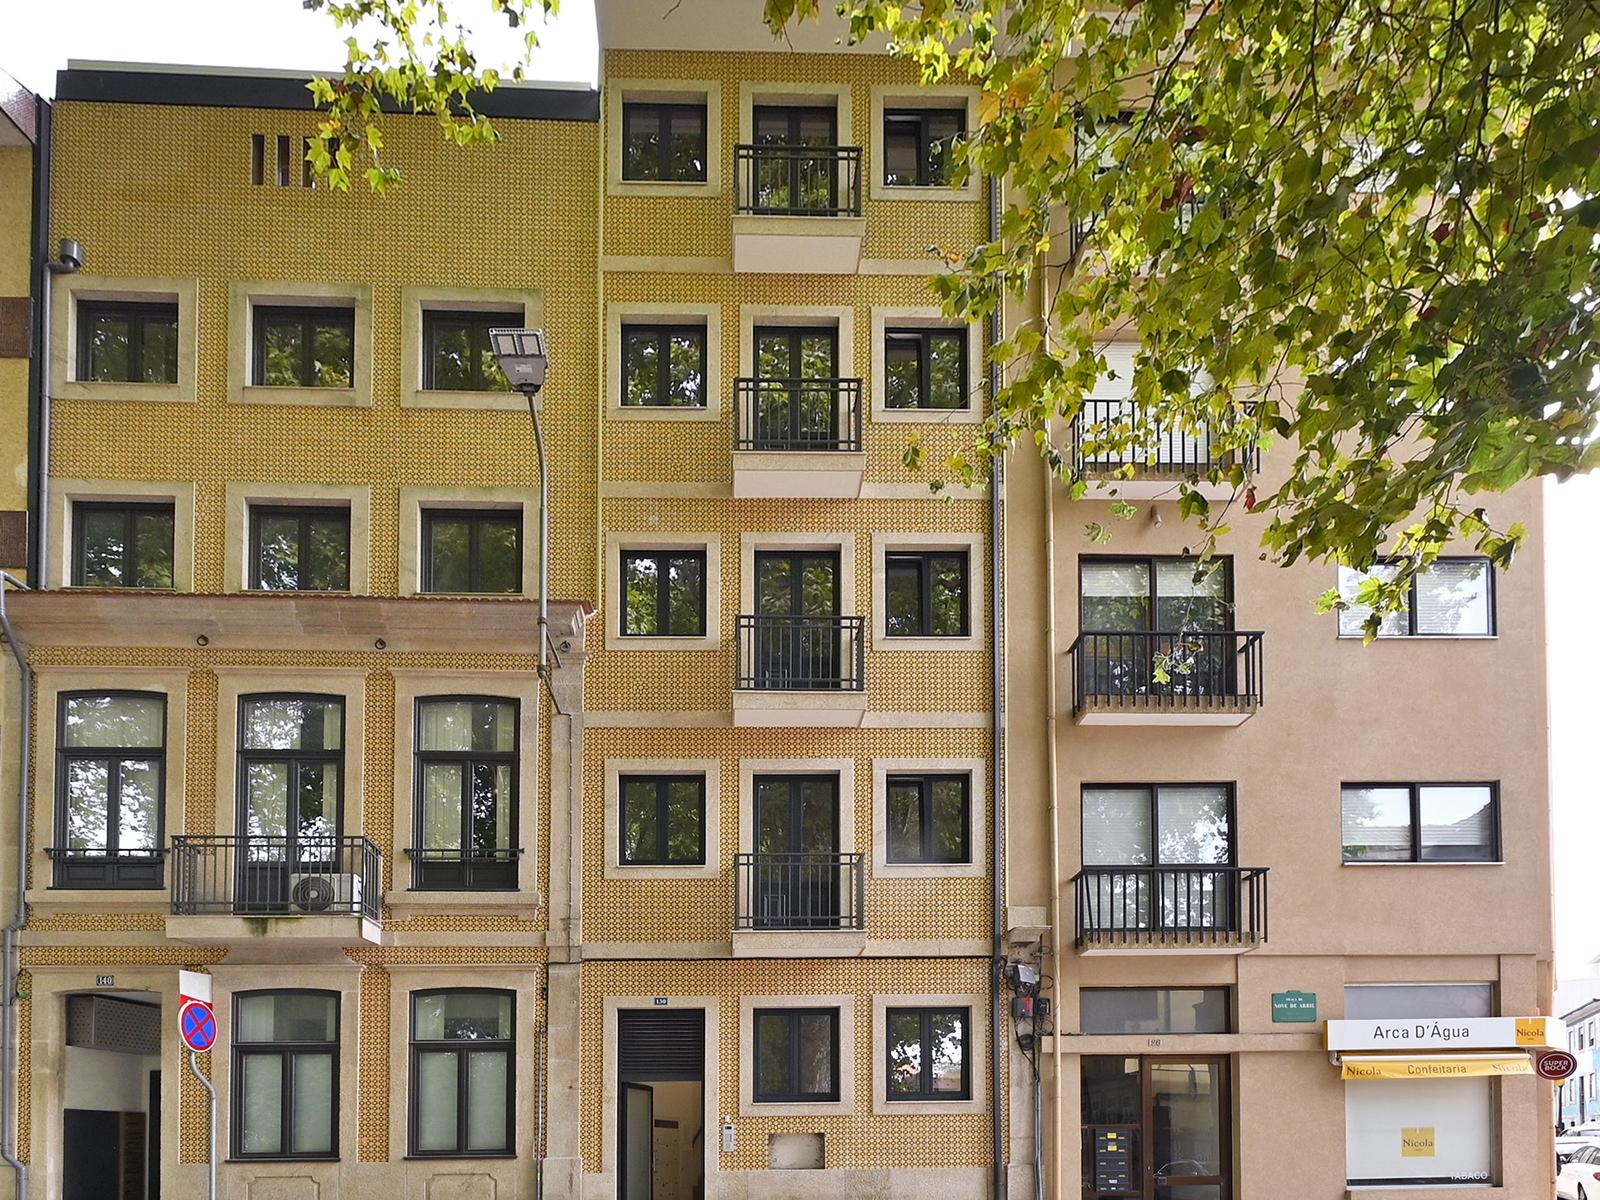 New Apartment in Arca d'Água – 105.7 m²